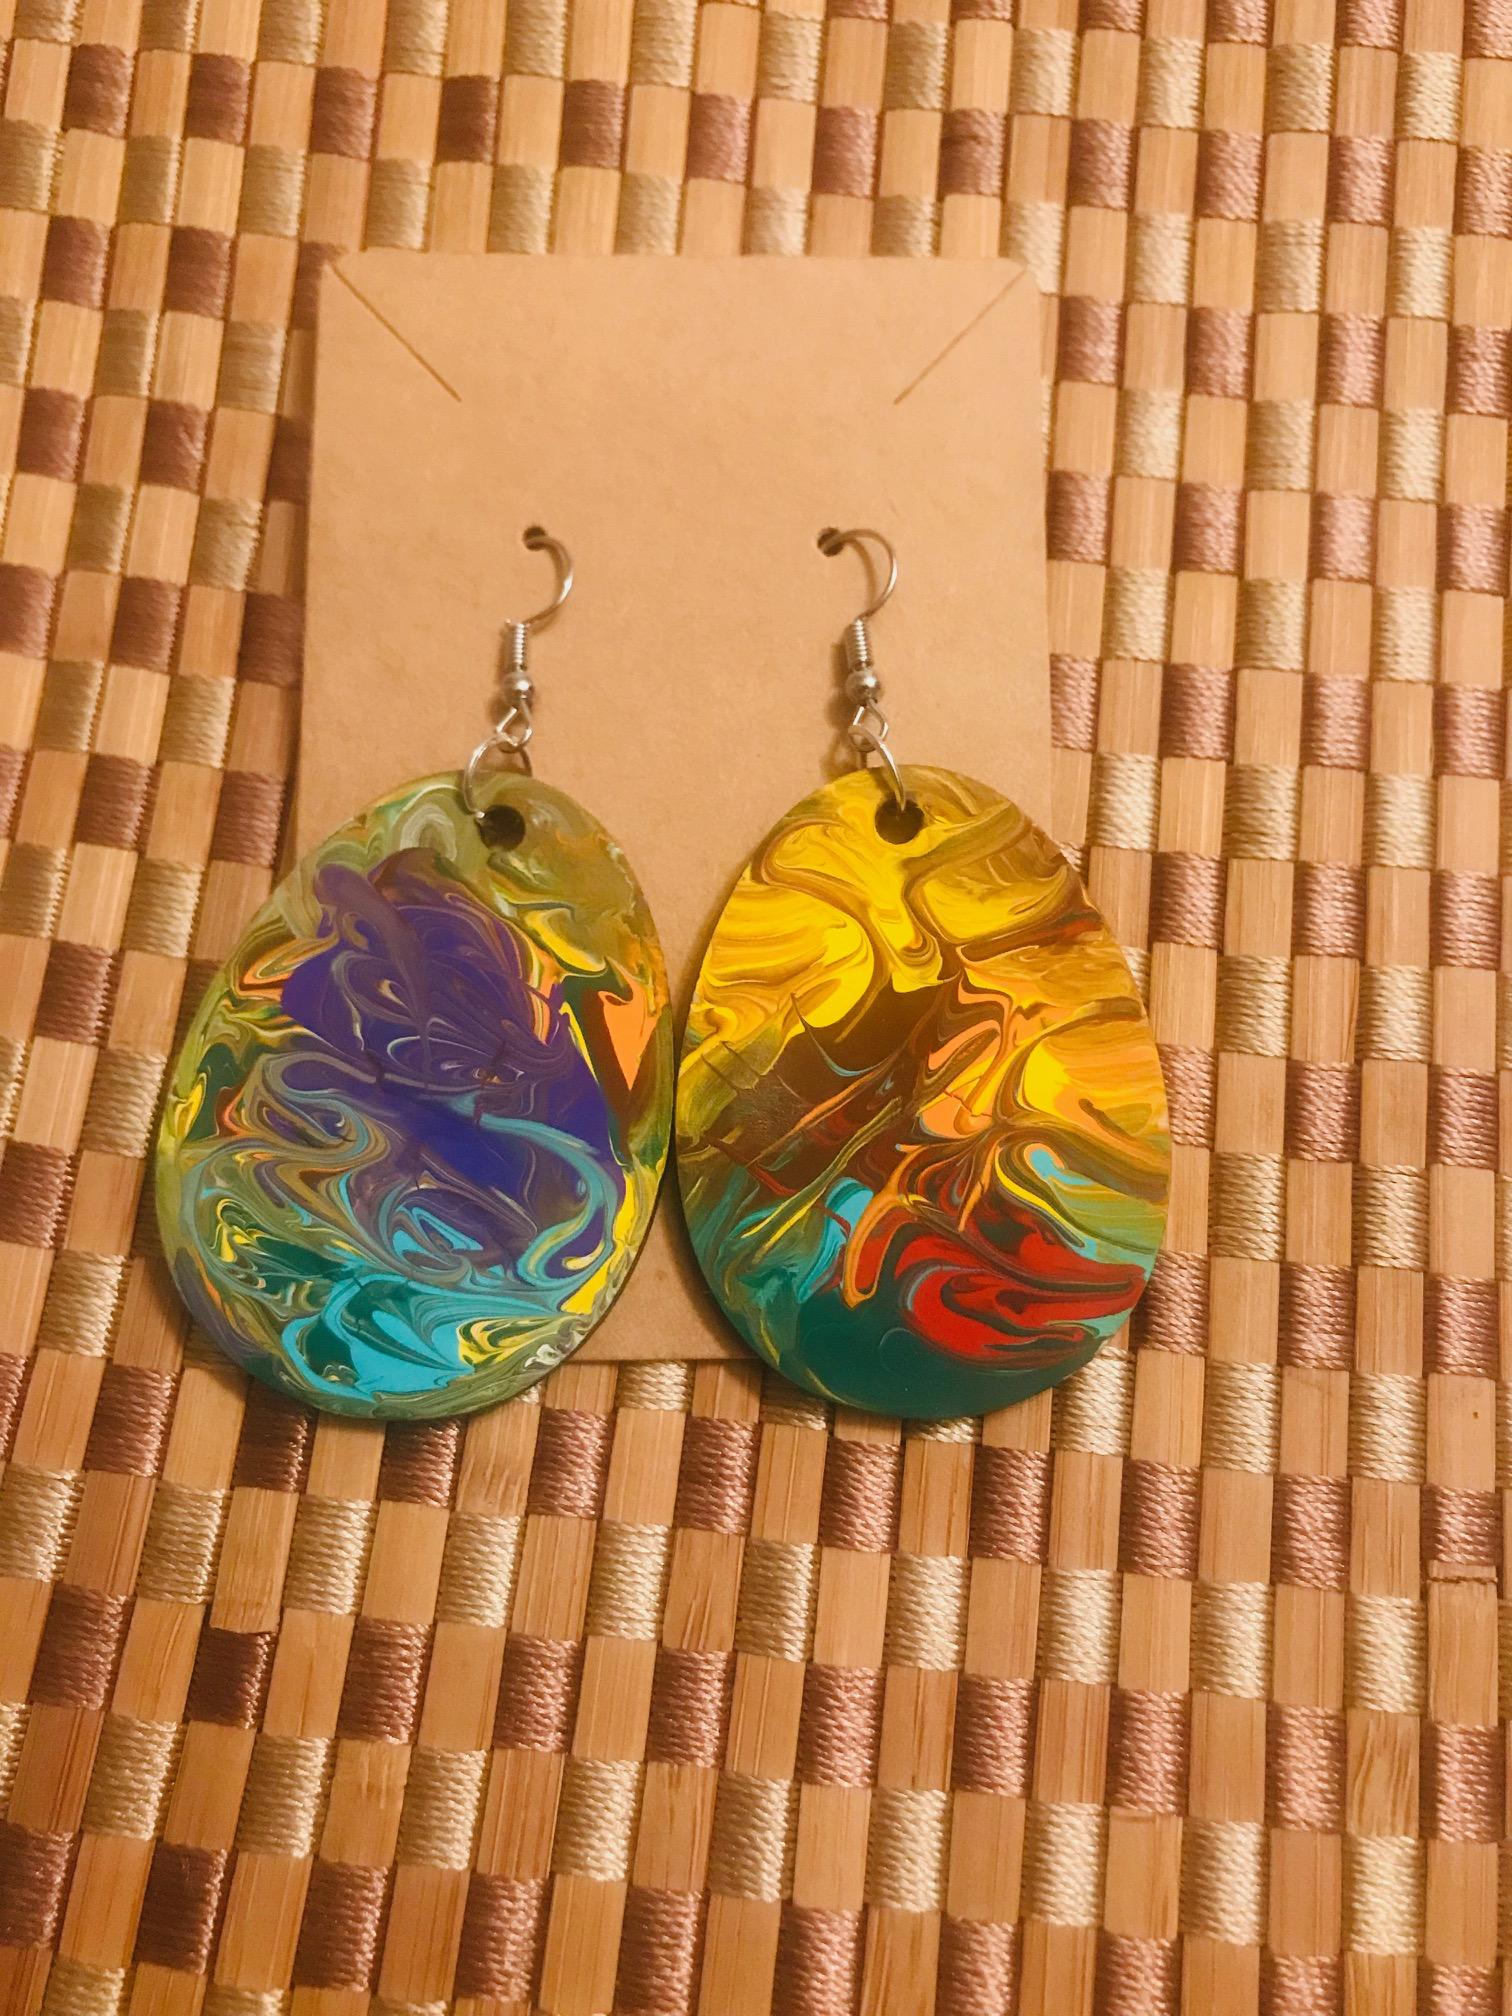 Custom-Made & Hand-Painted Healing Earrings \